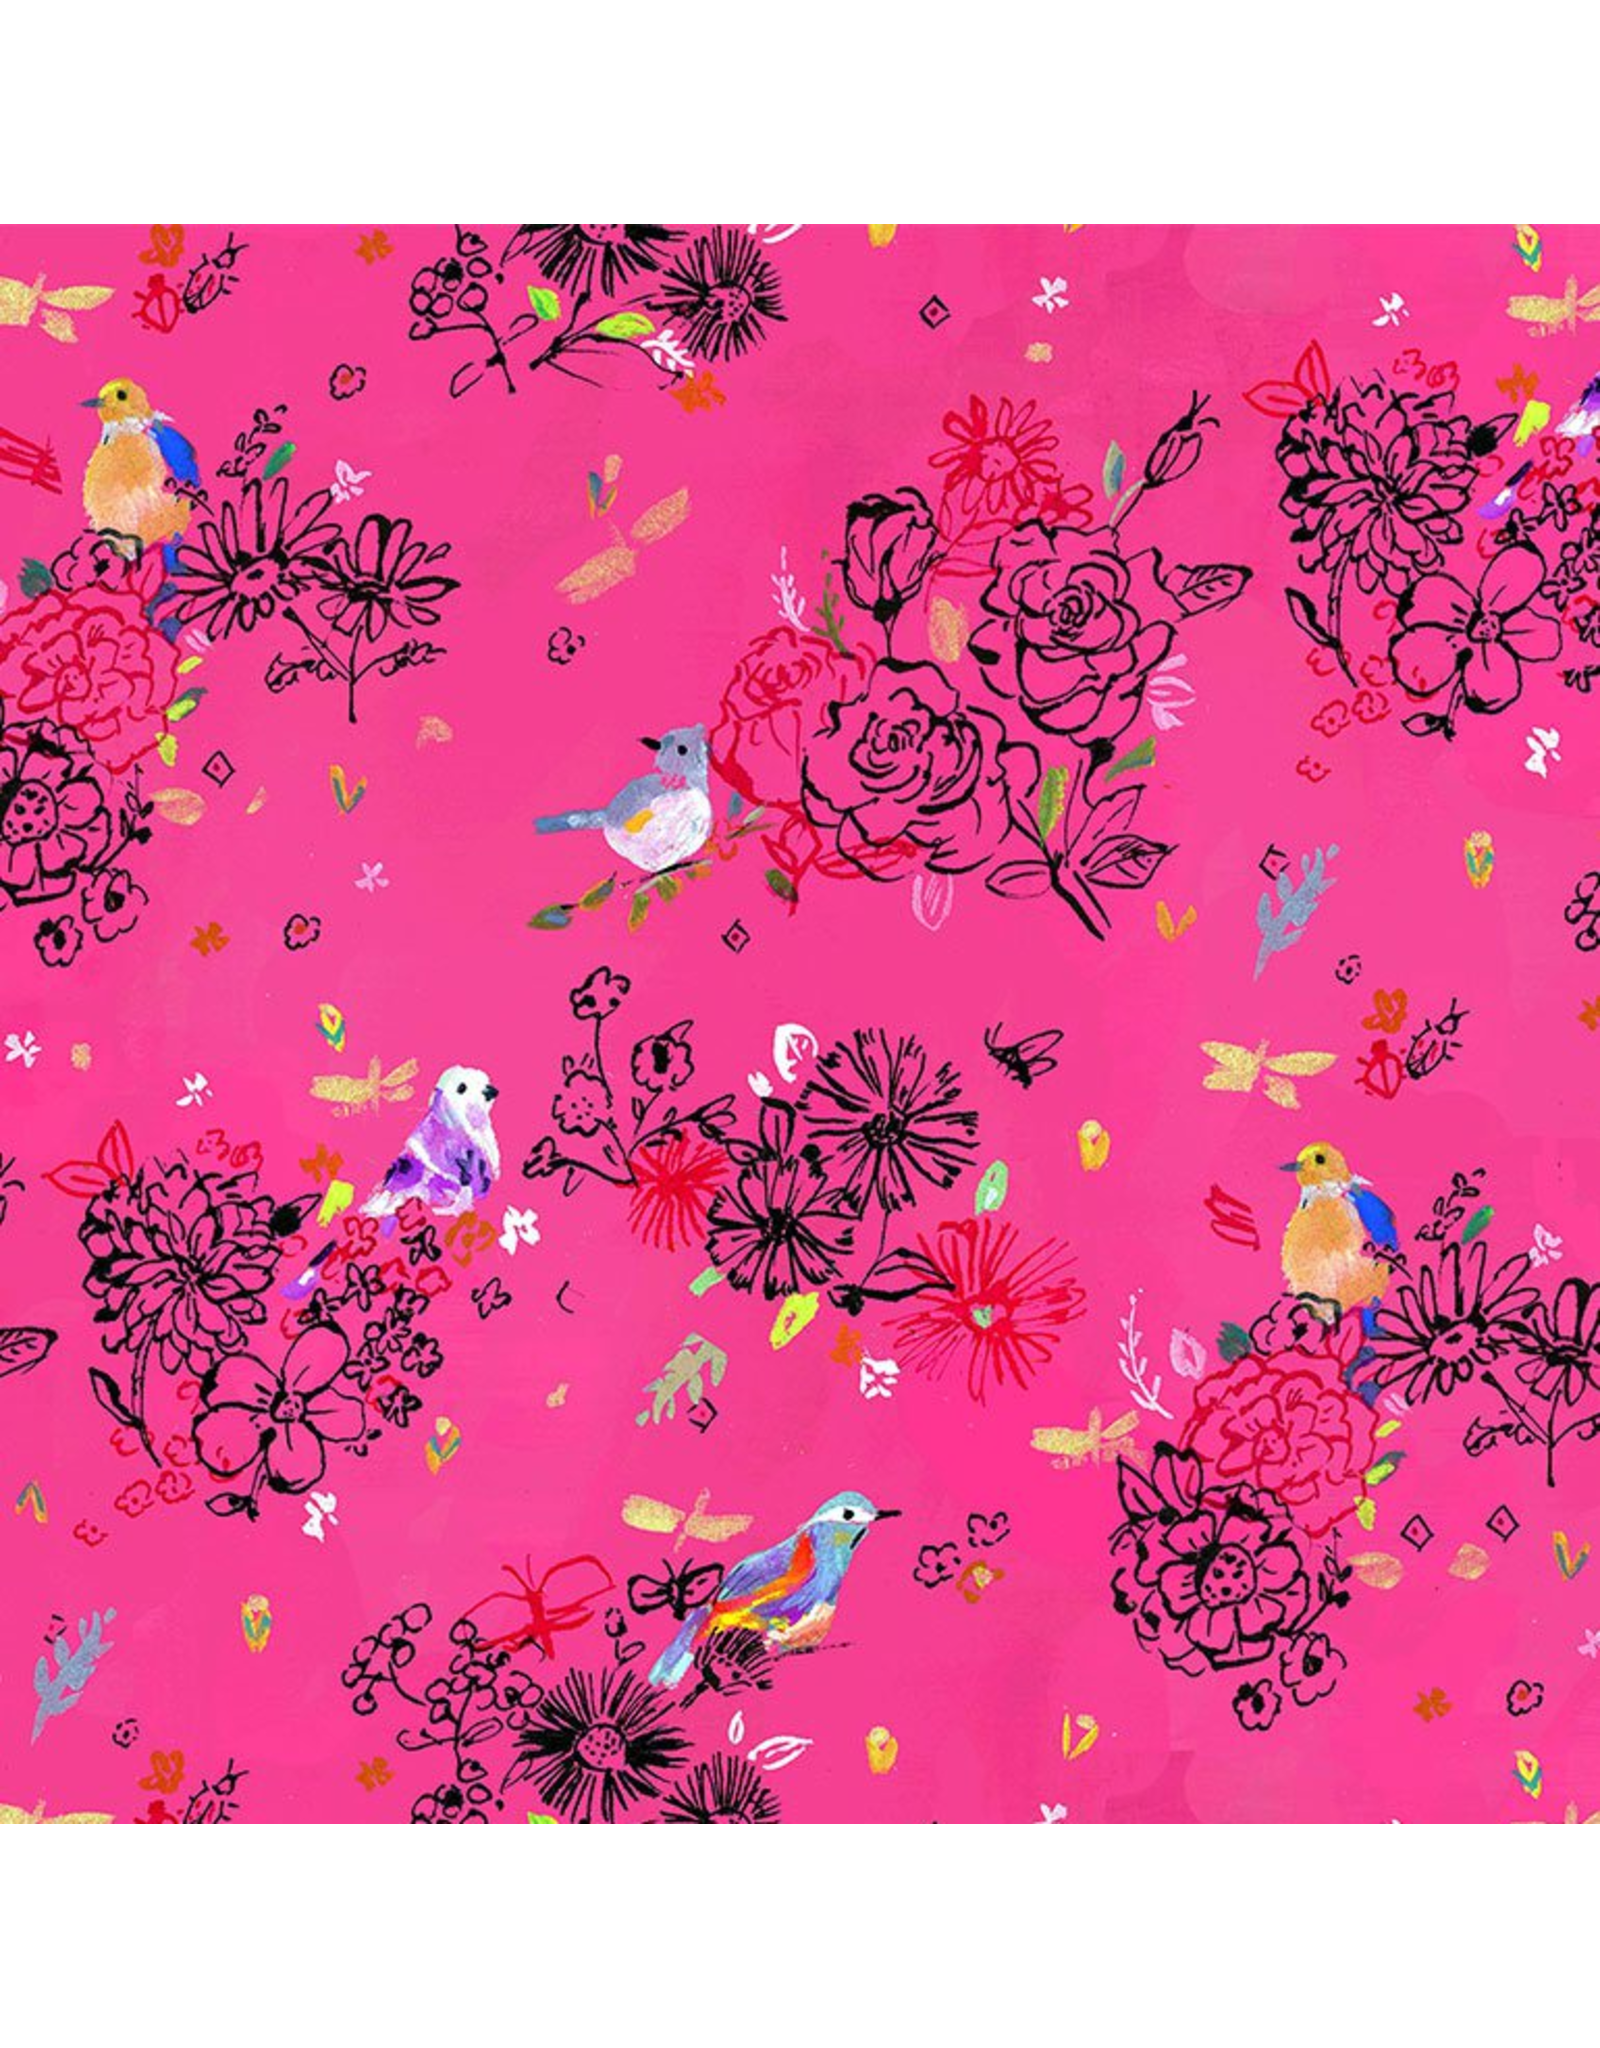 August Wren Tree of Life, Bird Floral in Pink, Fabric Half-Yards STELLA-DJL1753